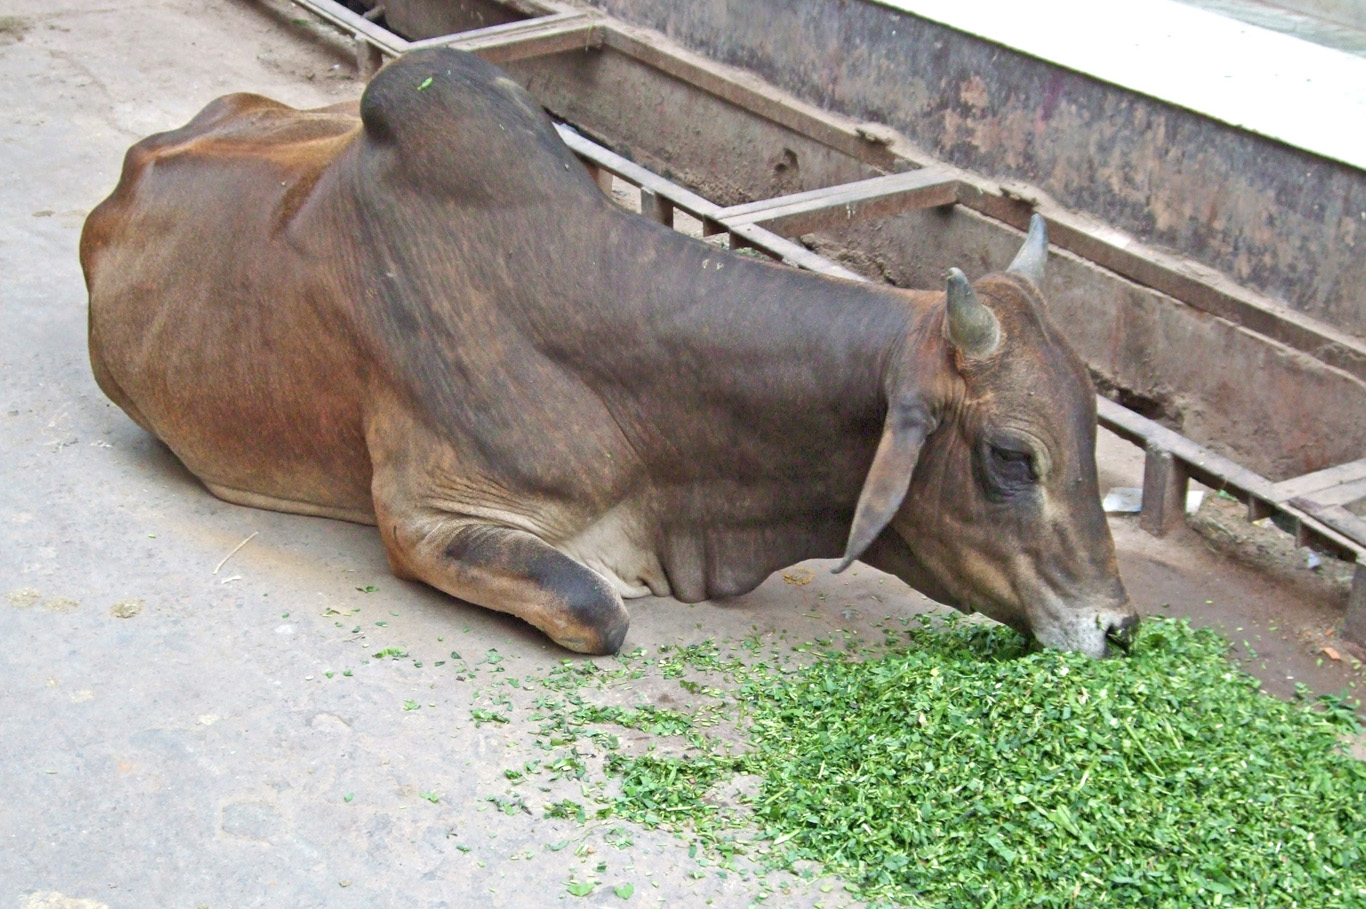 A cow in Mathura